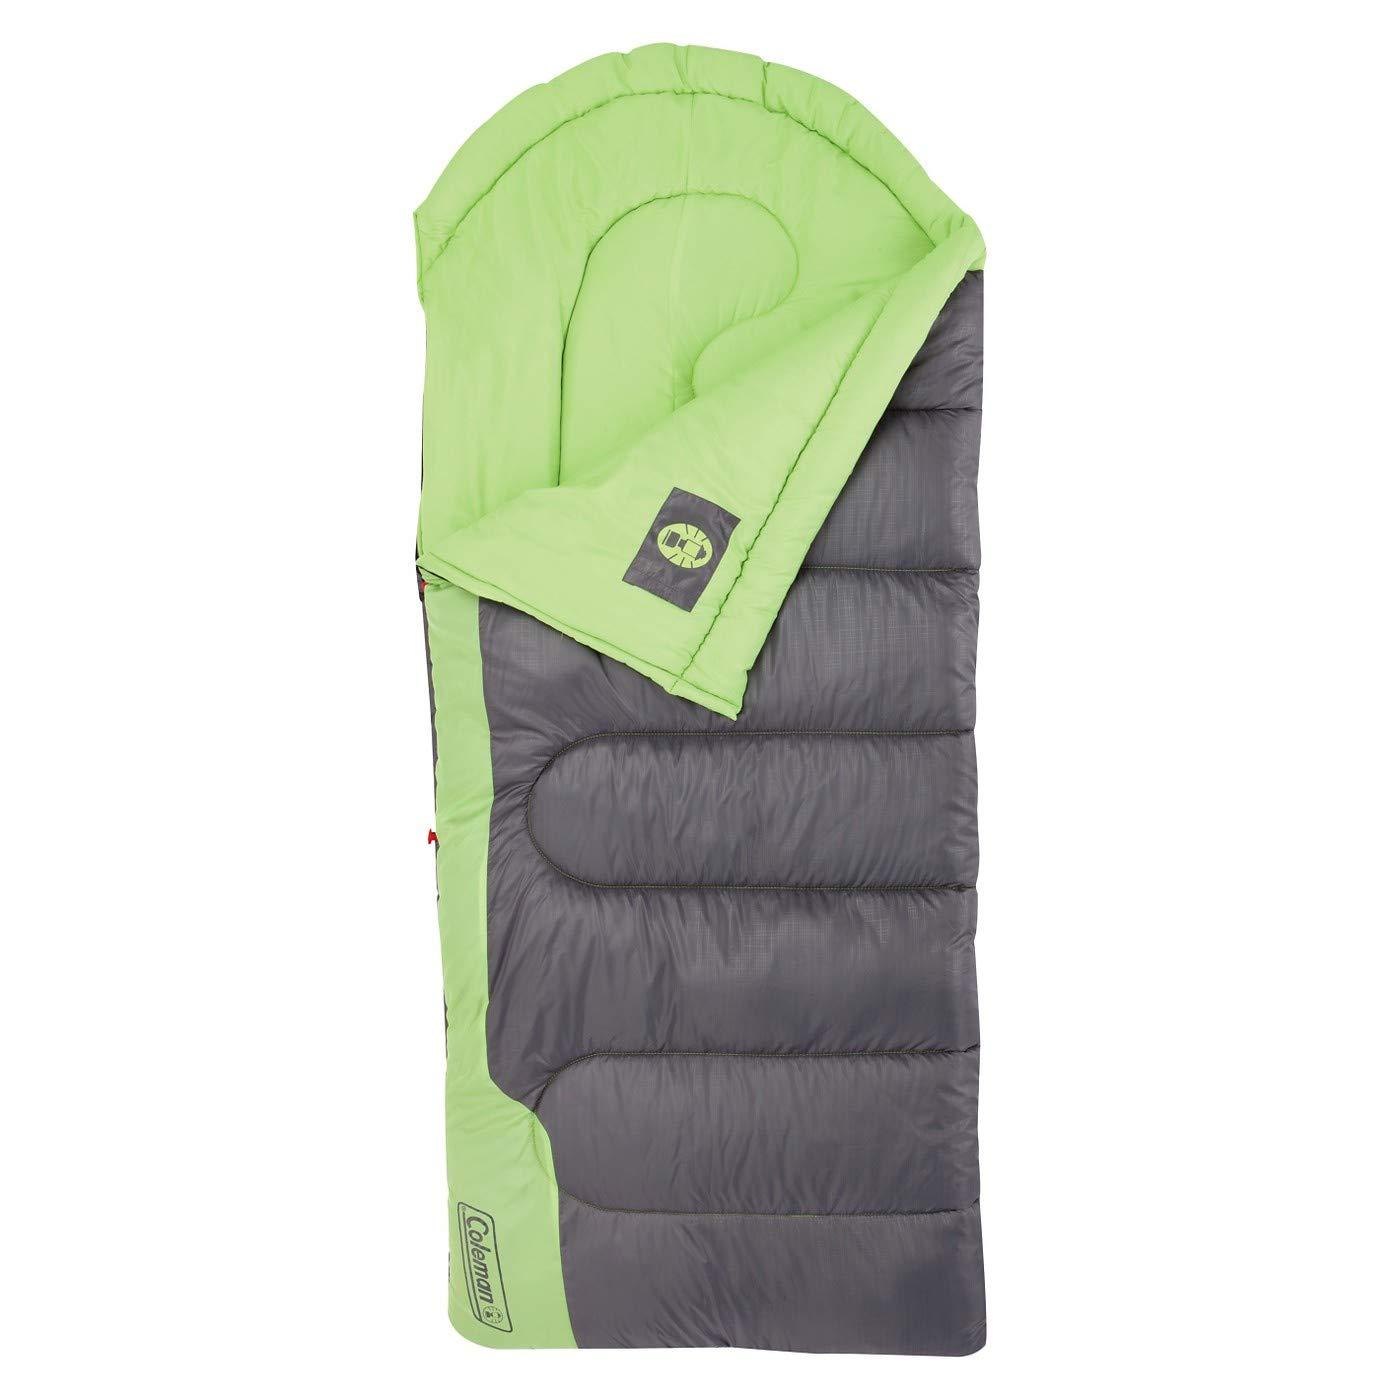 An image of Coleman Raymer 40 Degree Sleeping Bag | Expert Camper